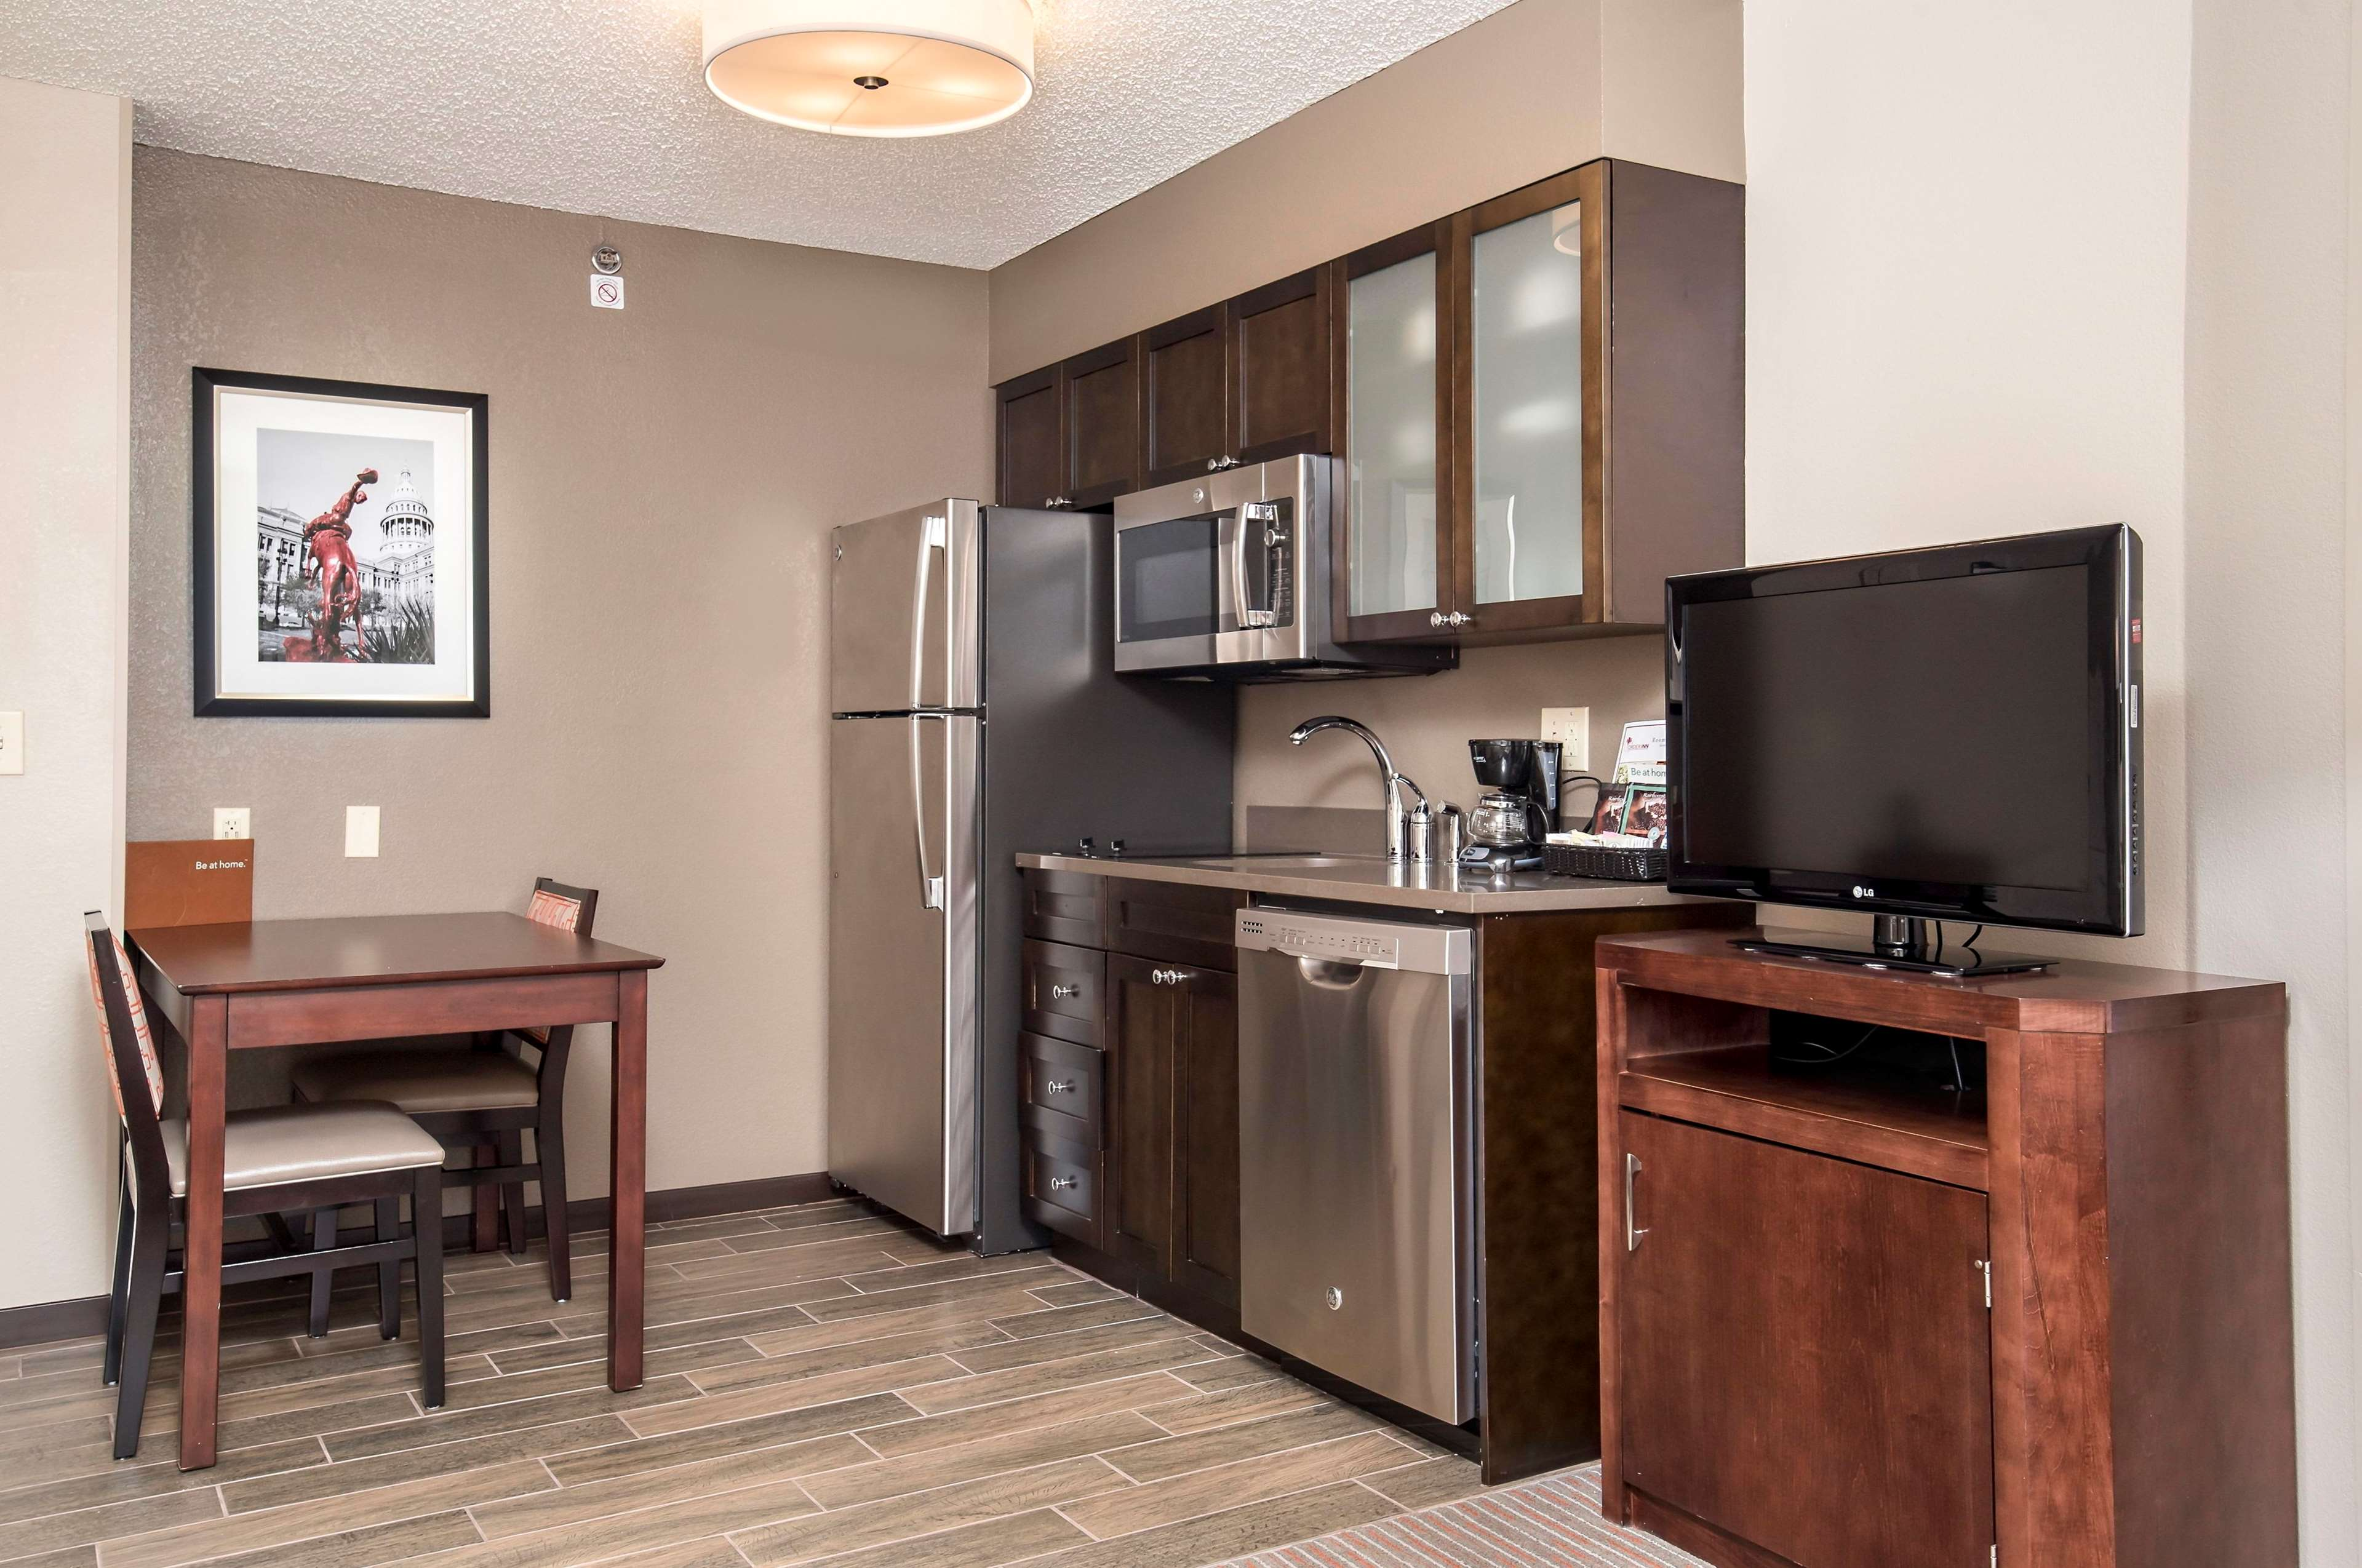 Homewood Suites by Hilton Austin-South/Airport image 12